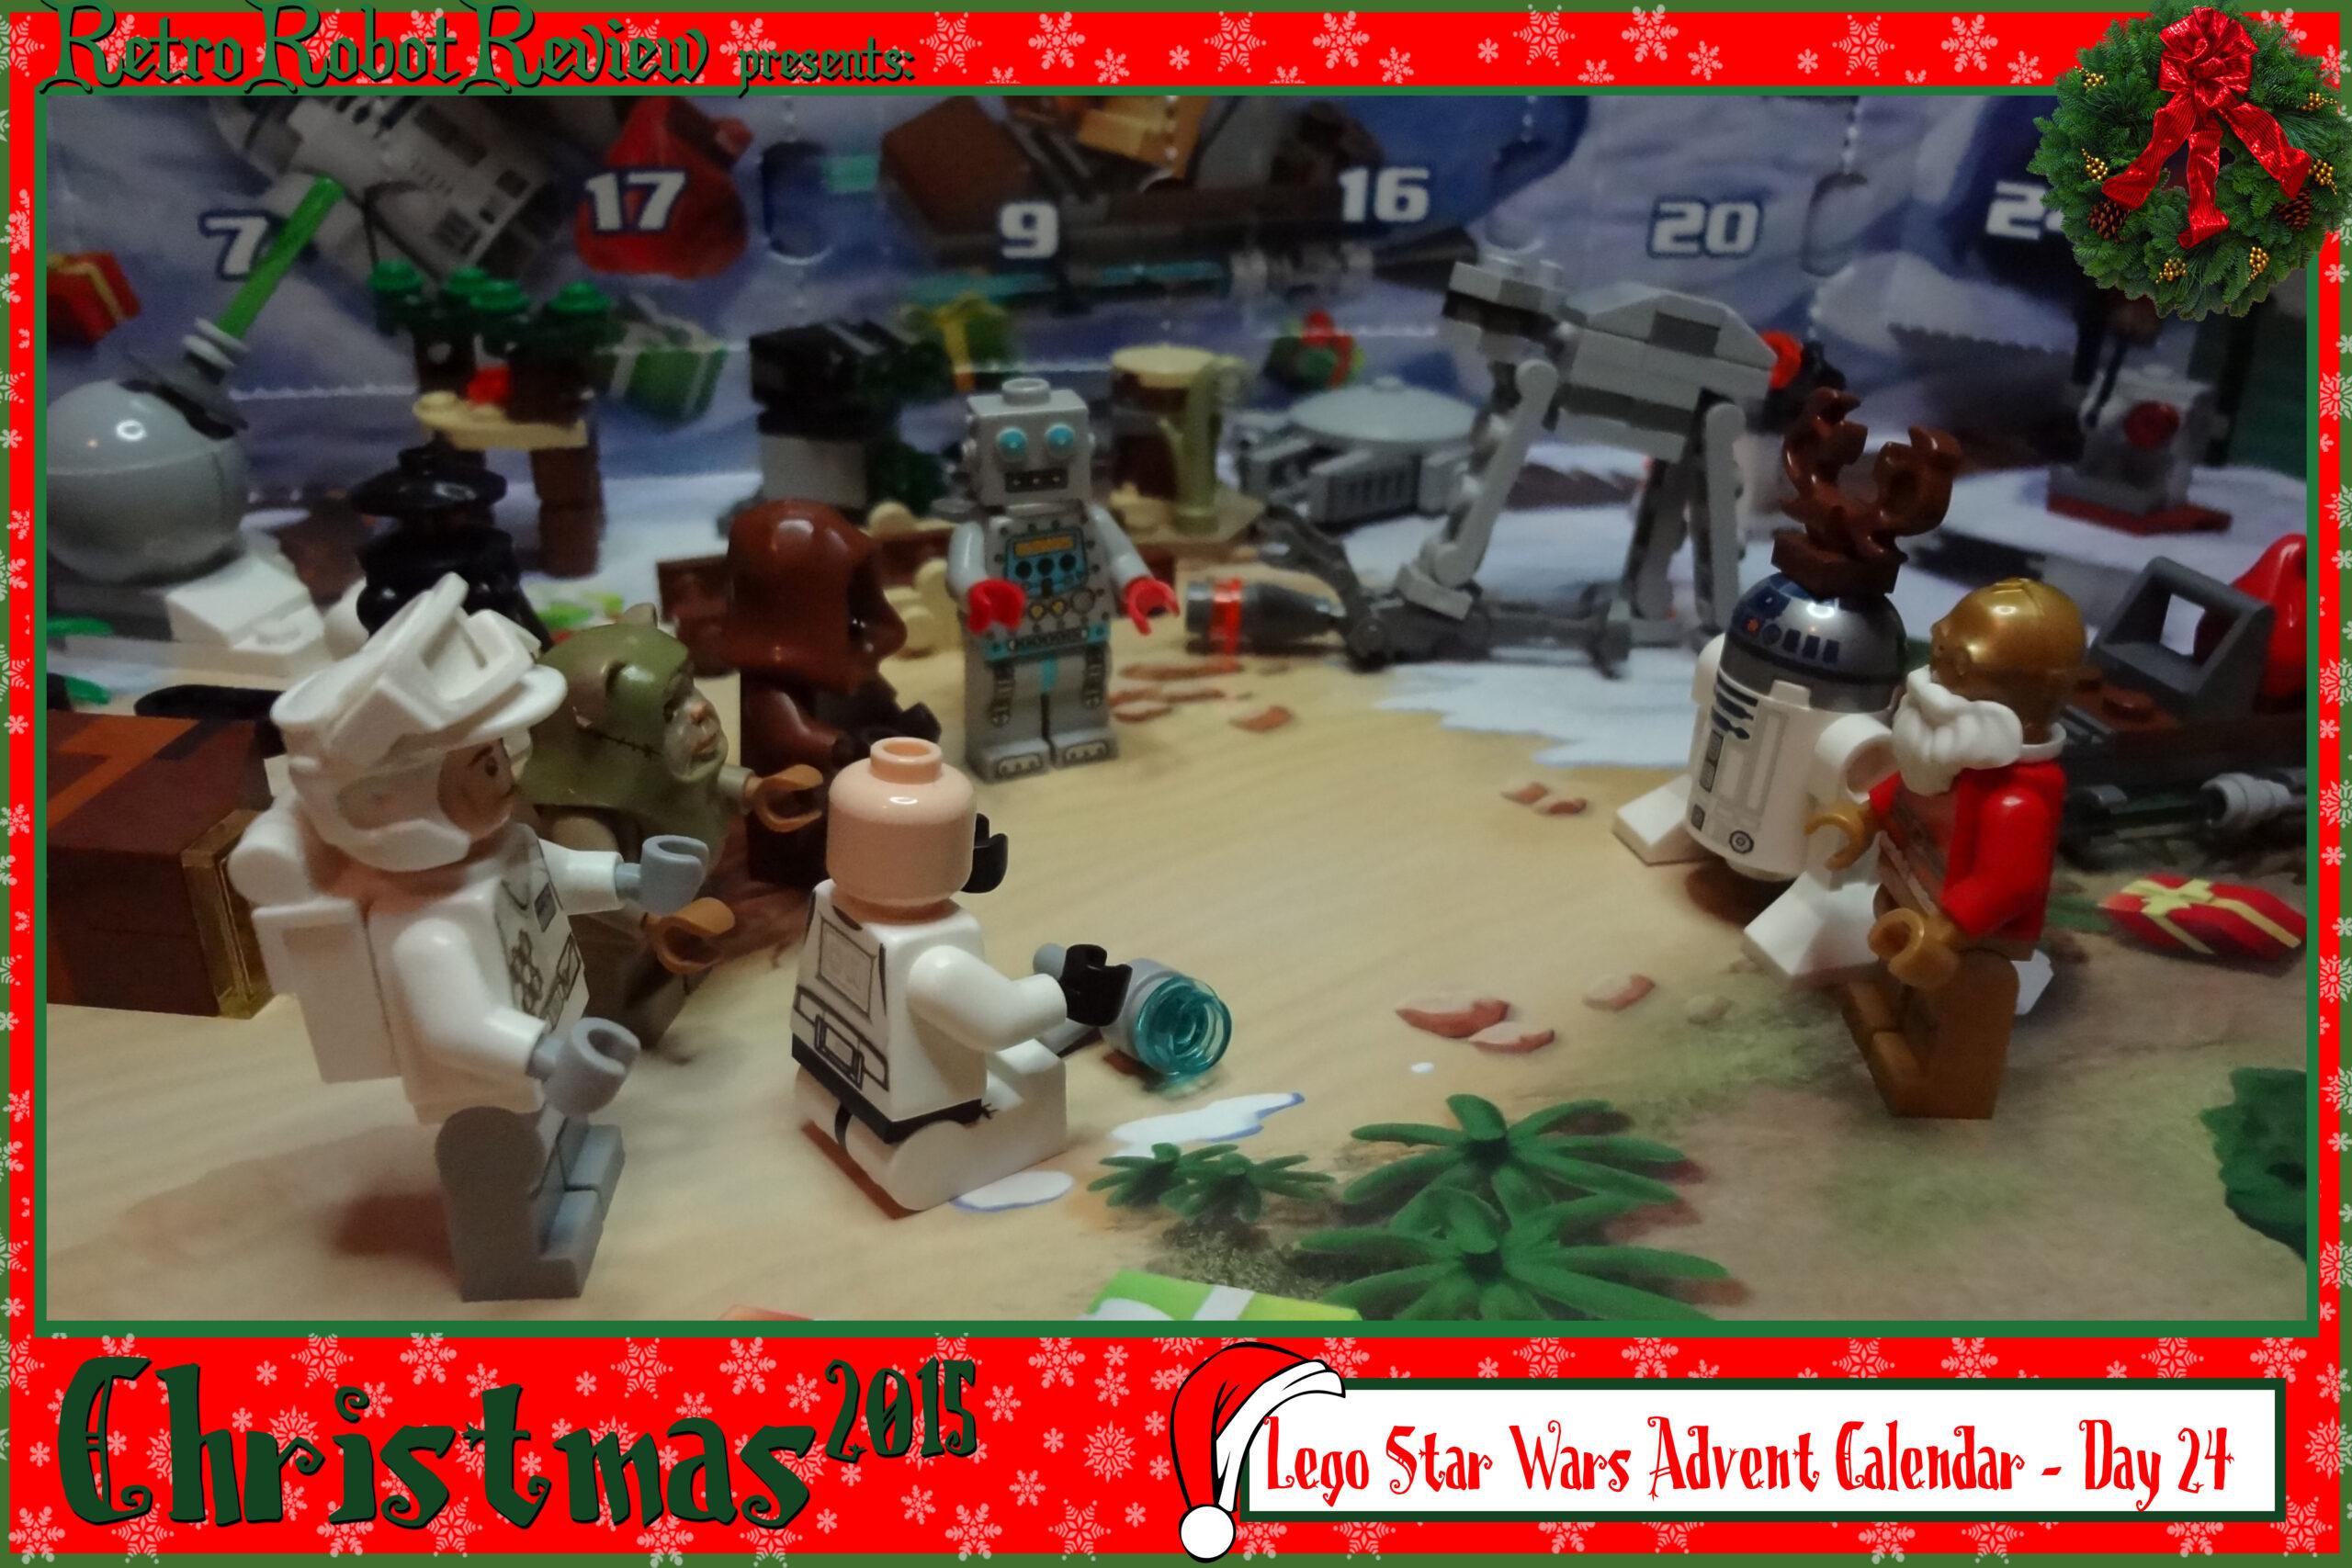 Lego Star Wars Advent Calendar  Day 24 throughout Lego Star Wars Advent Calendar Instructions